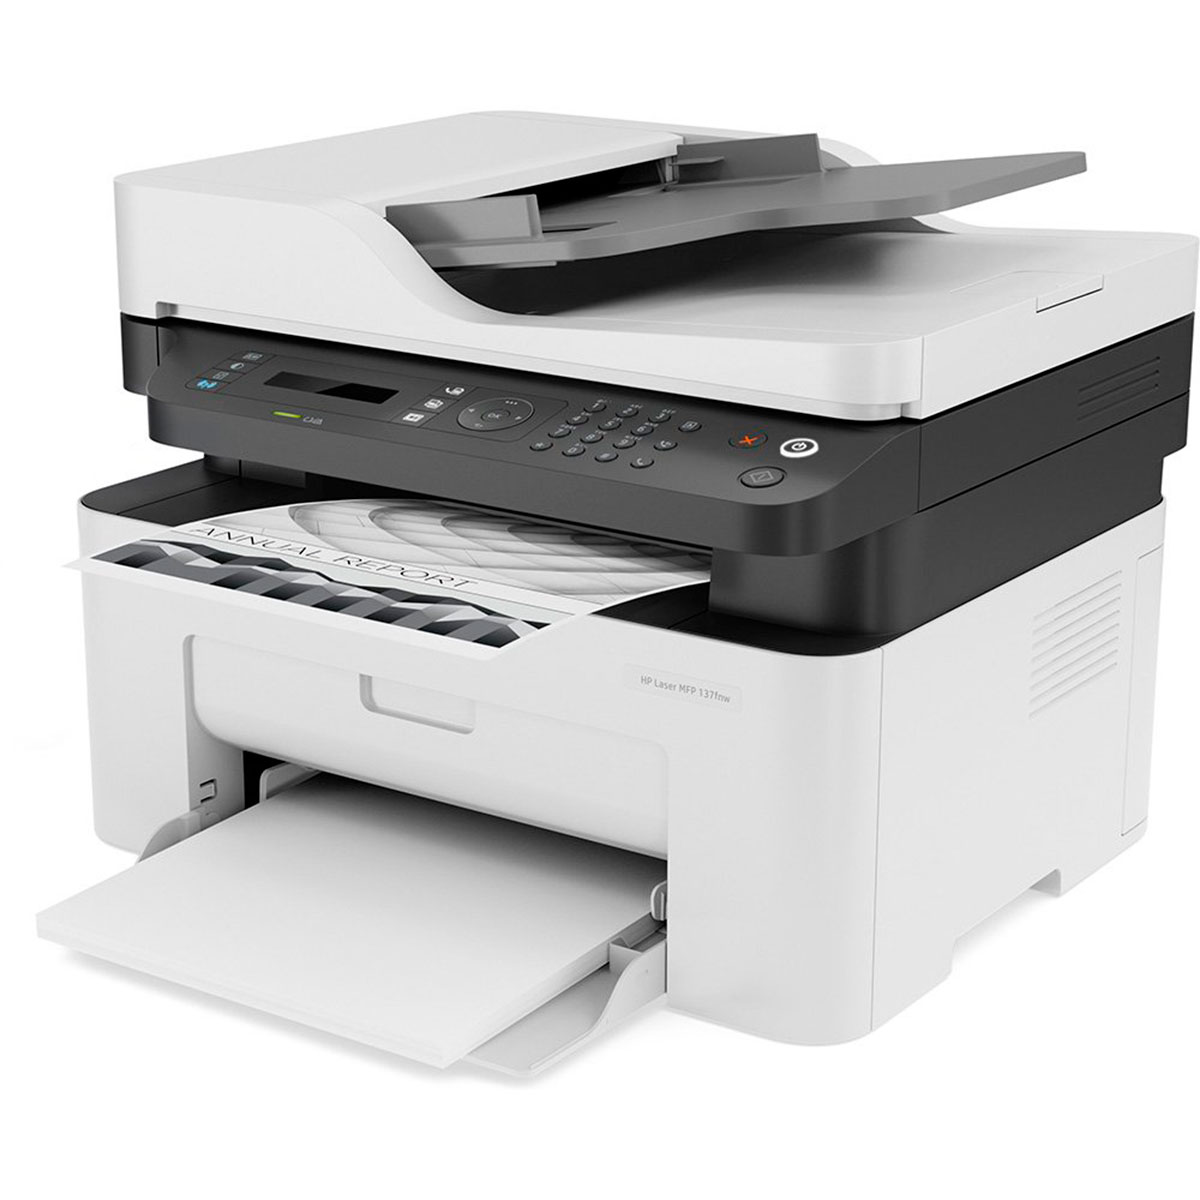 Impressora Multifuncional HP MFP 137FNW, Laser, Monovolt - 4ZB84A#AC4 - 110V